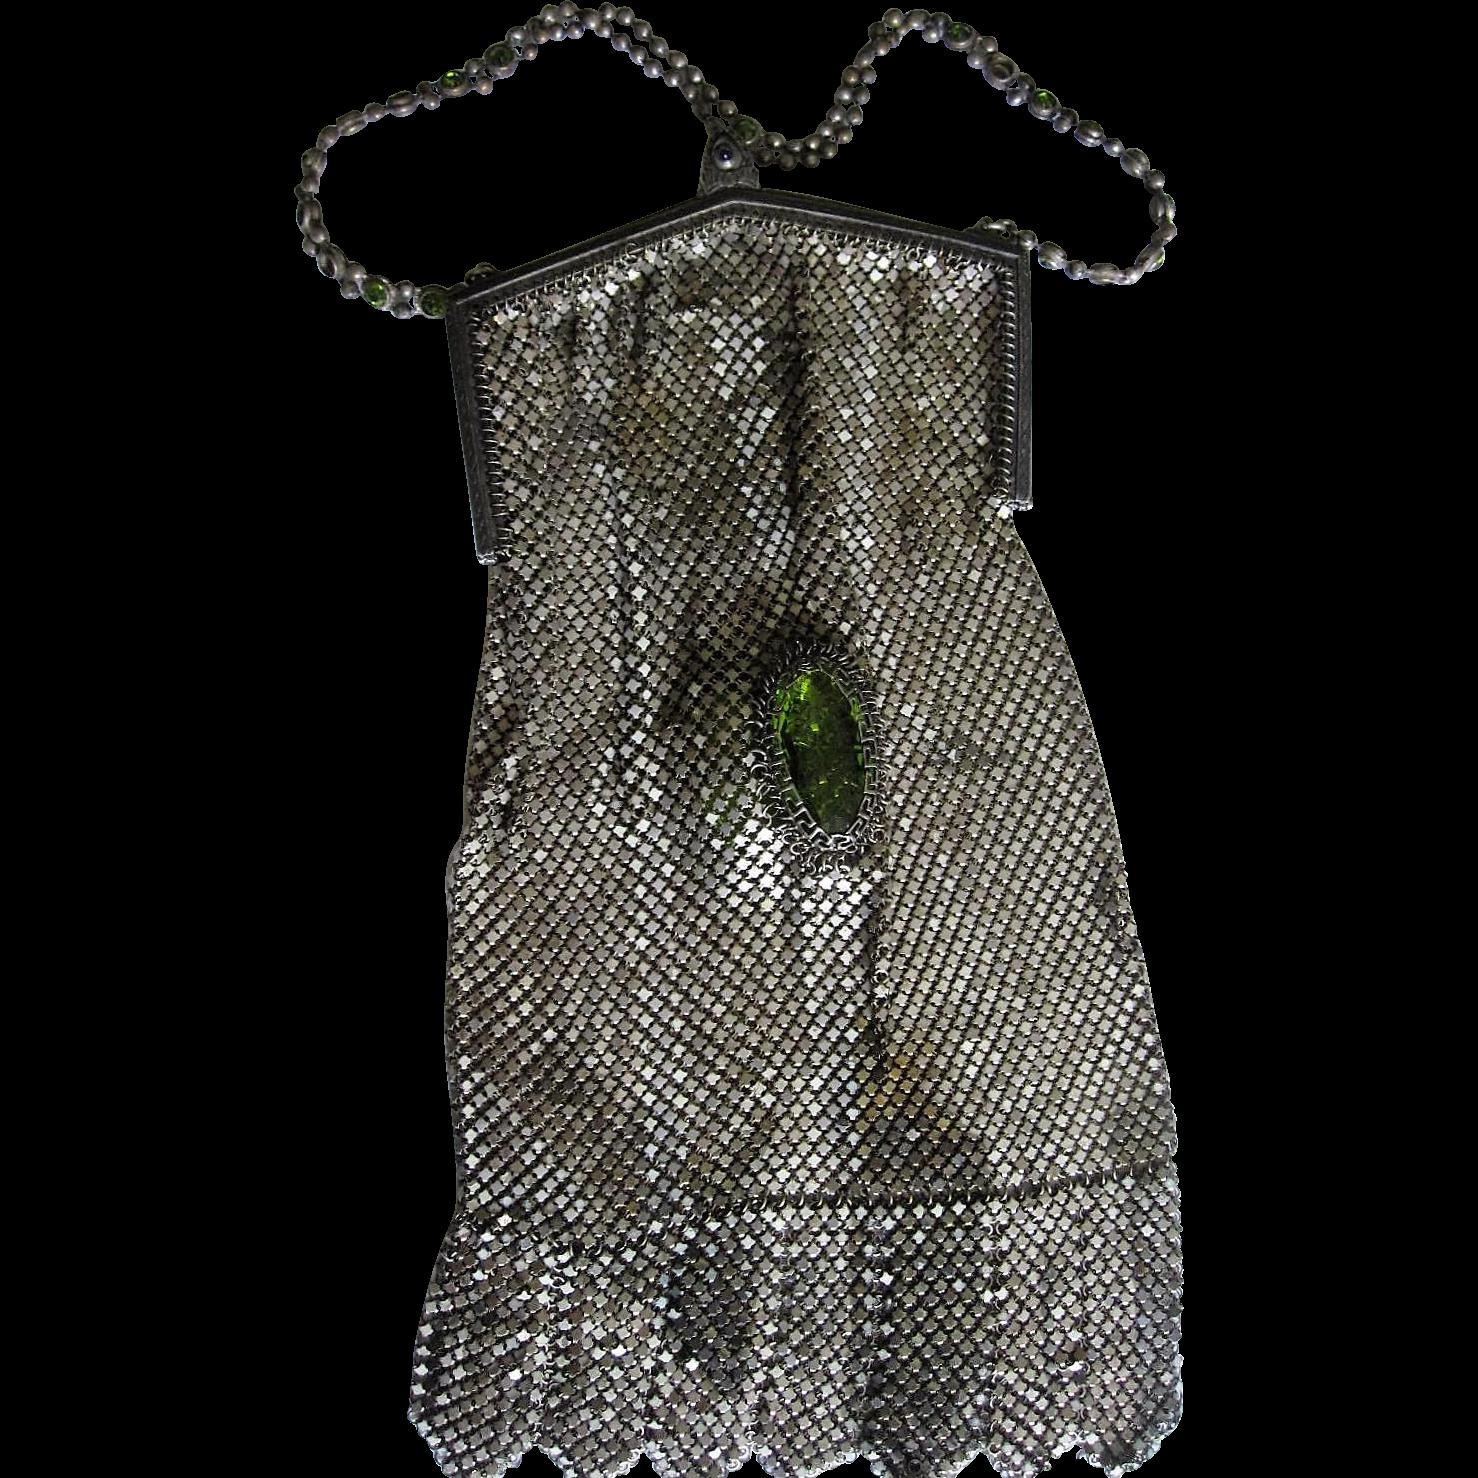 Rare Whiting & Davis Jeweled Enameled Mesh purse handbag bag BIG GREEN STONES in mesh body